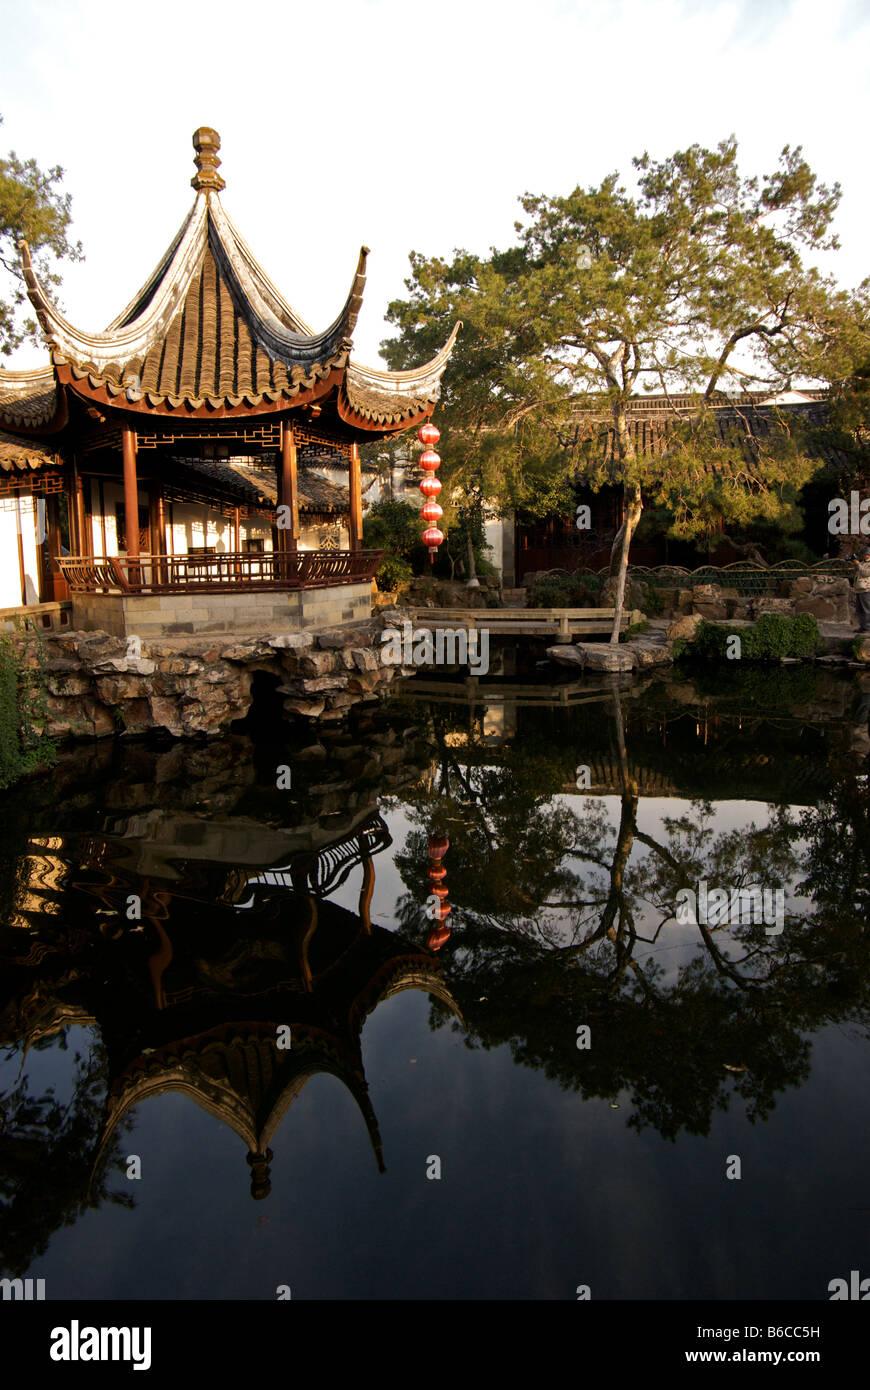 Classic Chinese Garden Stock Photos & Classic Chinese Garden Stock ...